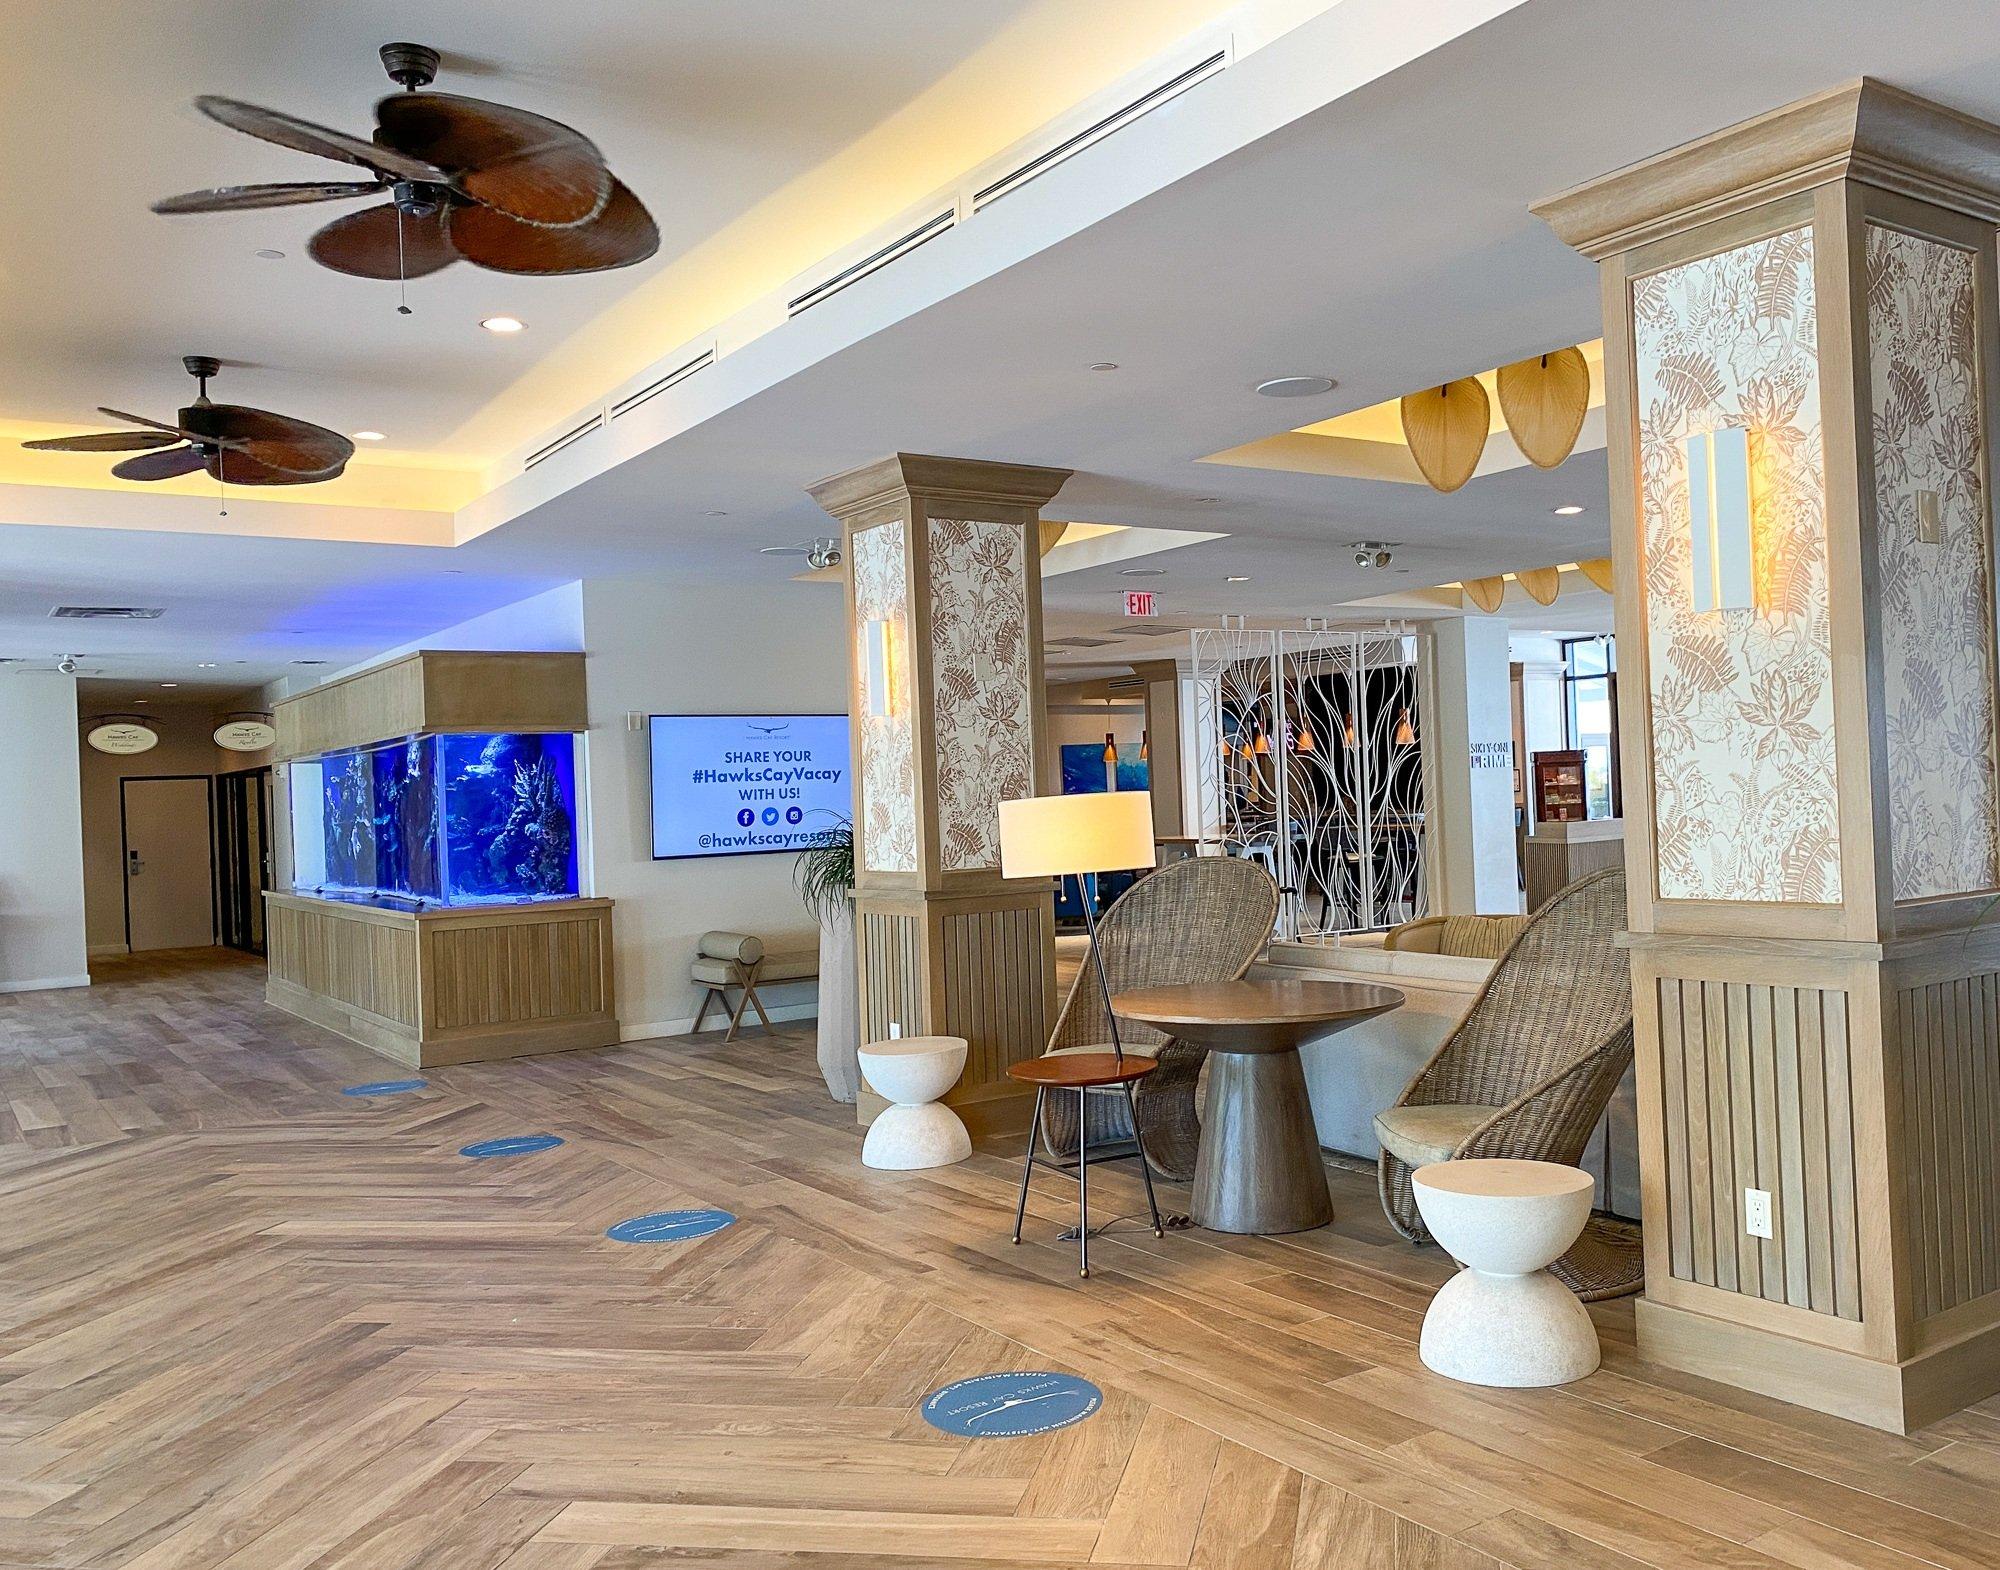 Hawks Cay Resort lobby with aquarium